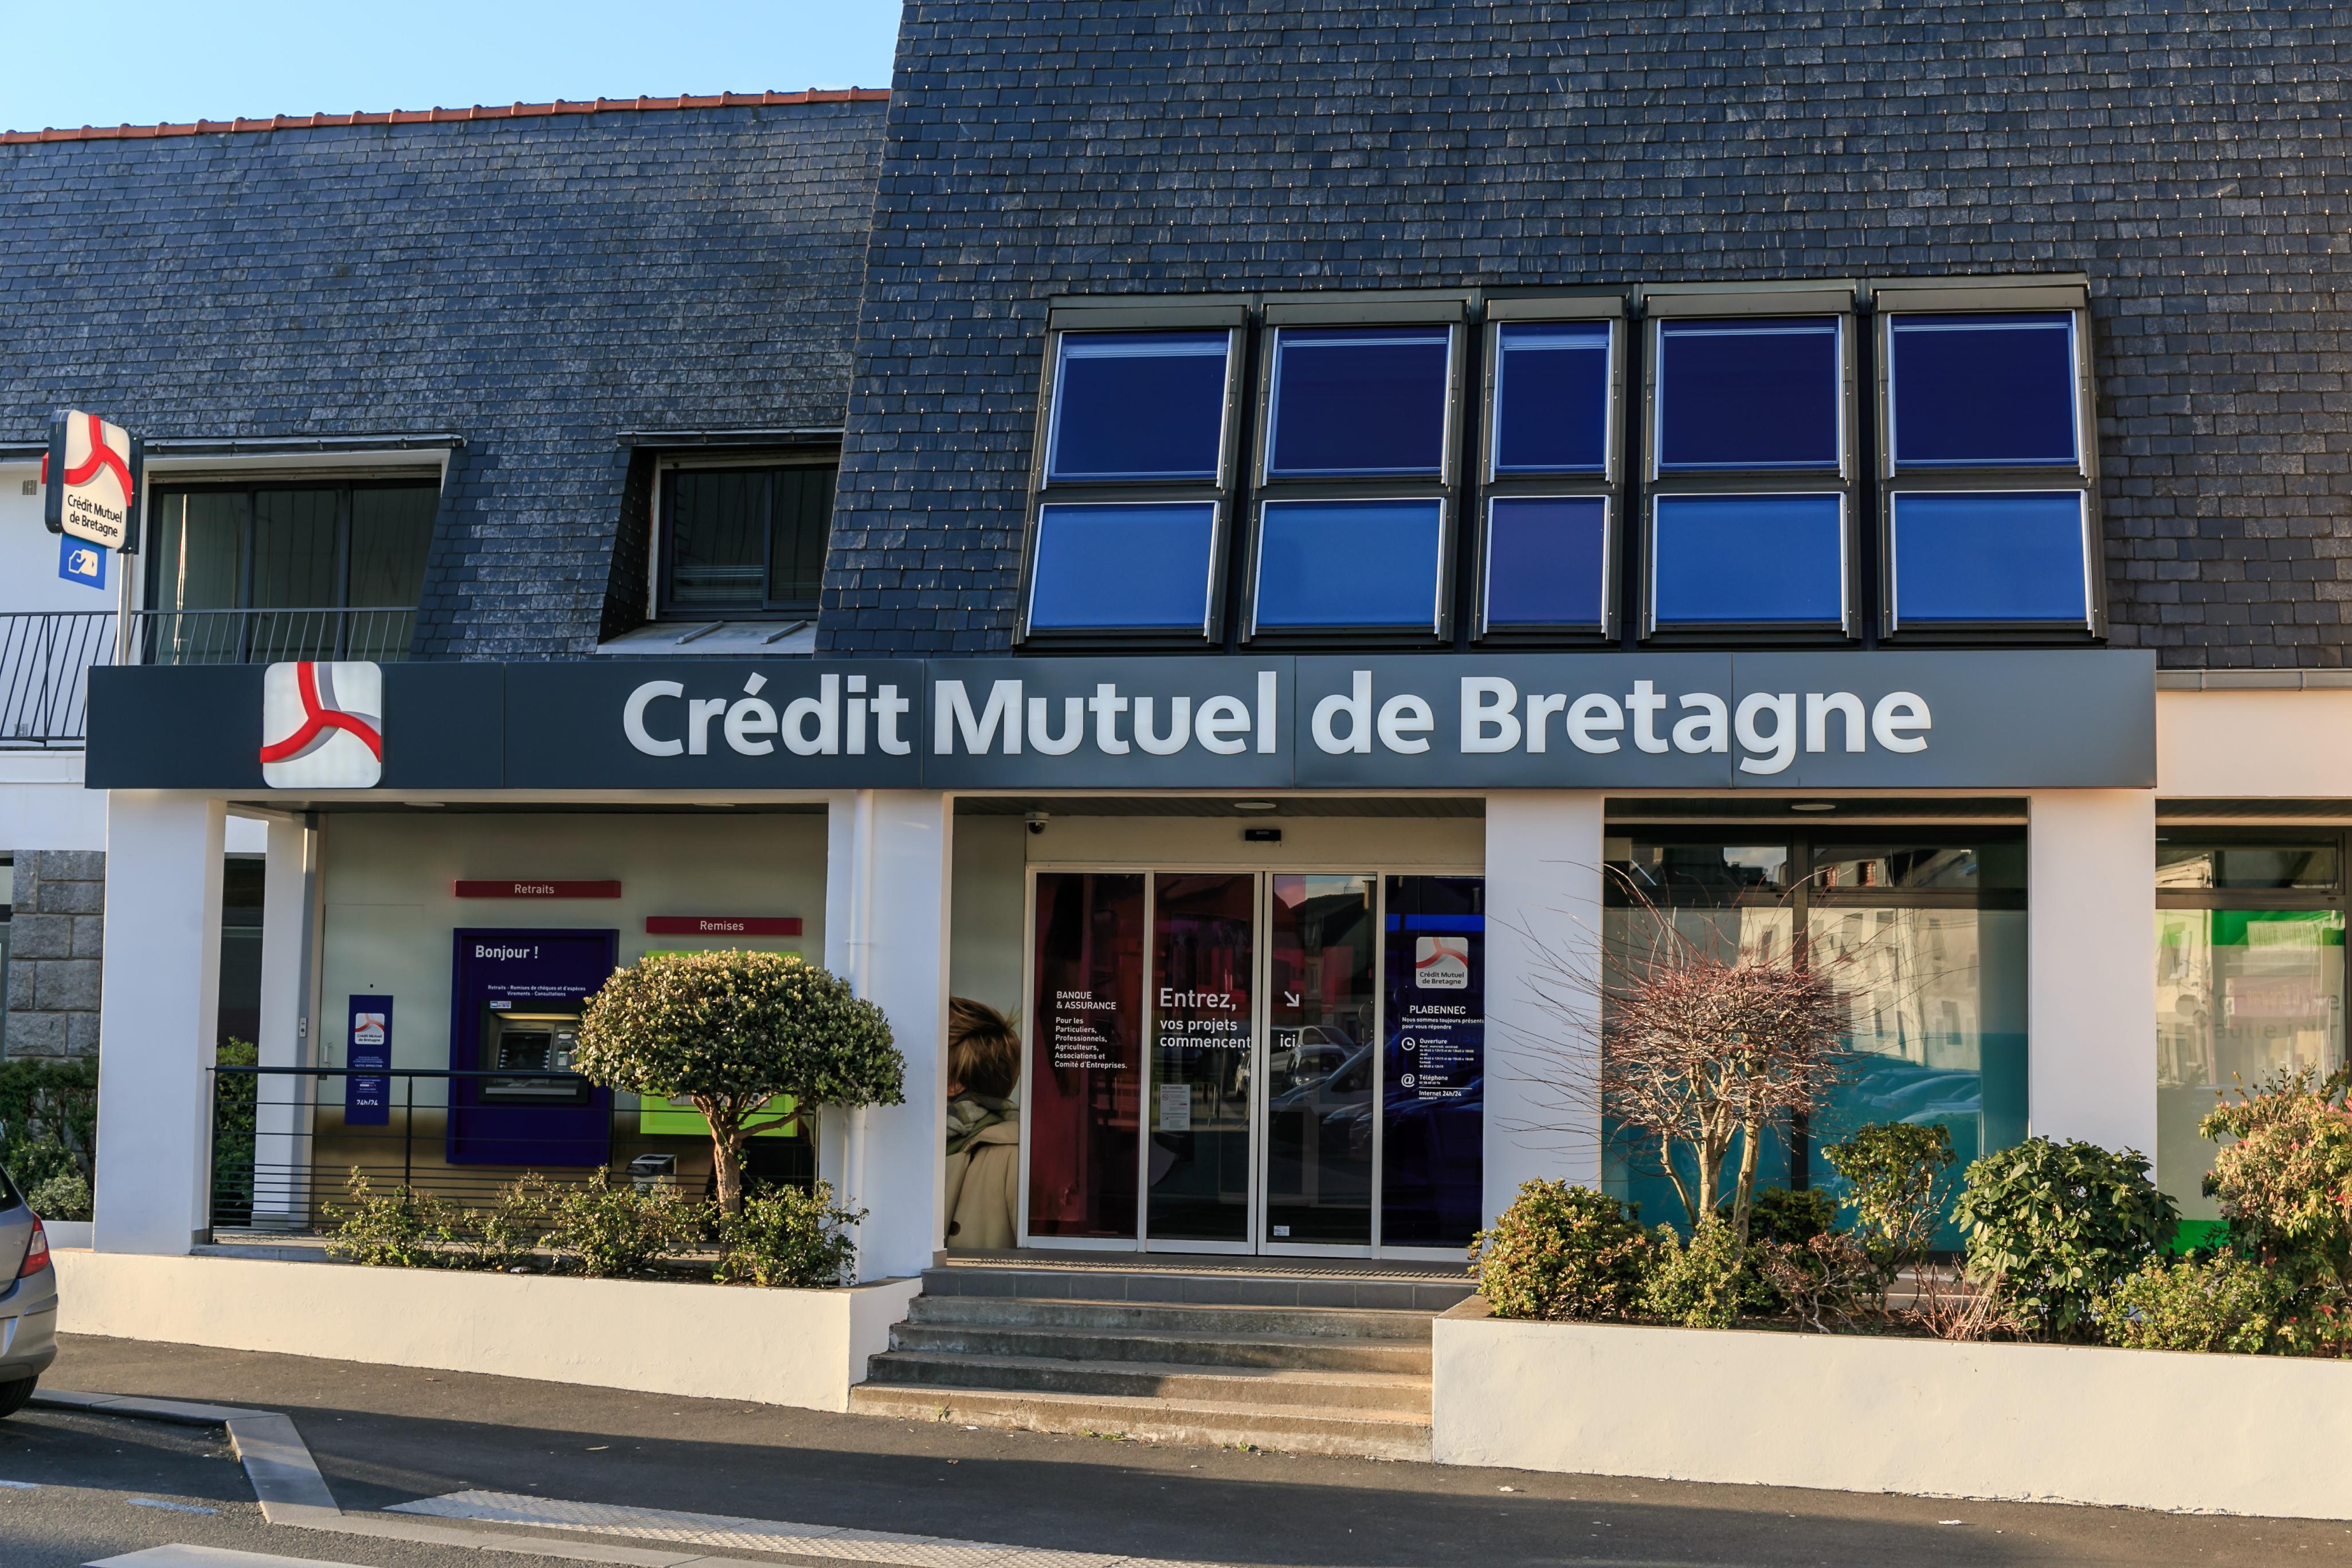 File:Crédit mutuel de Bretagne agence Plabennec.jpg - Wikimedia Commons